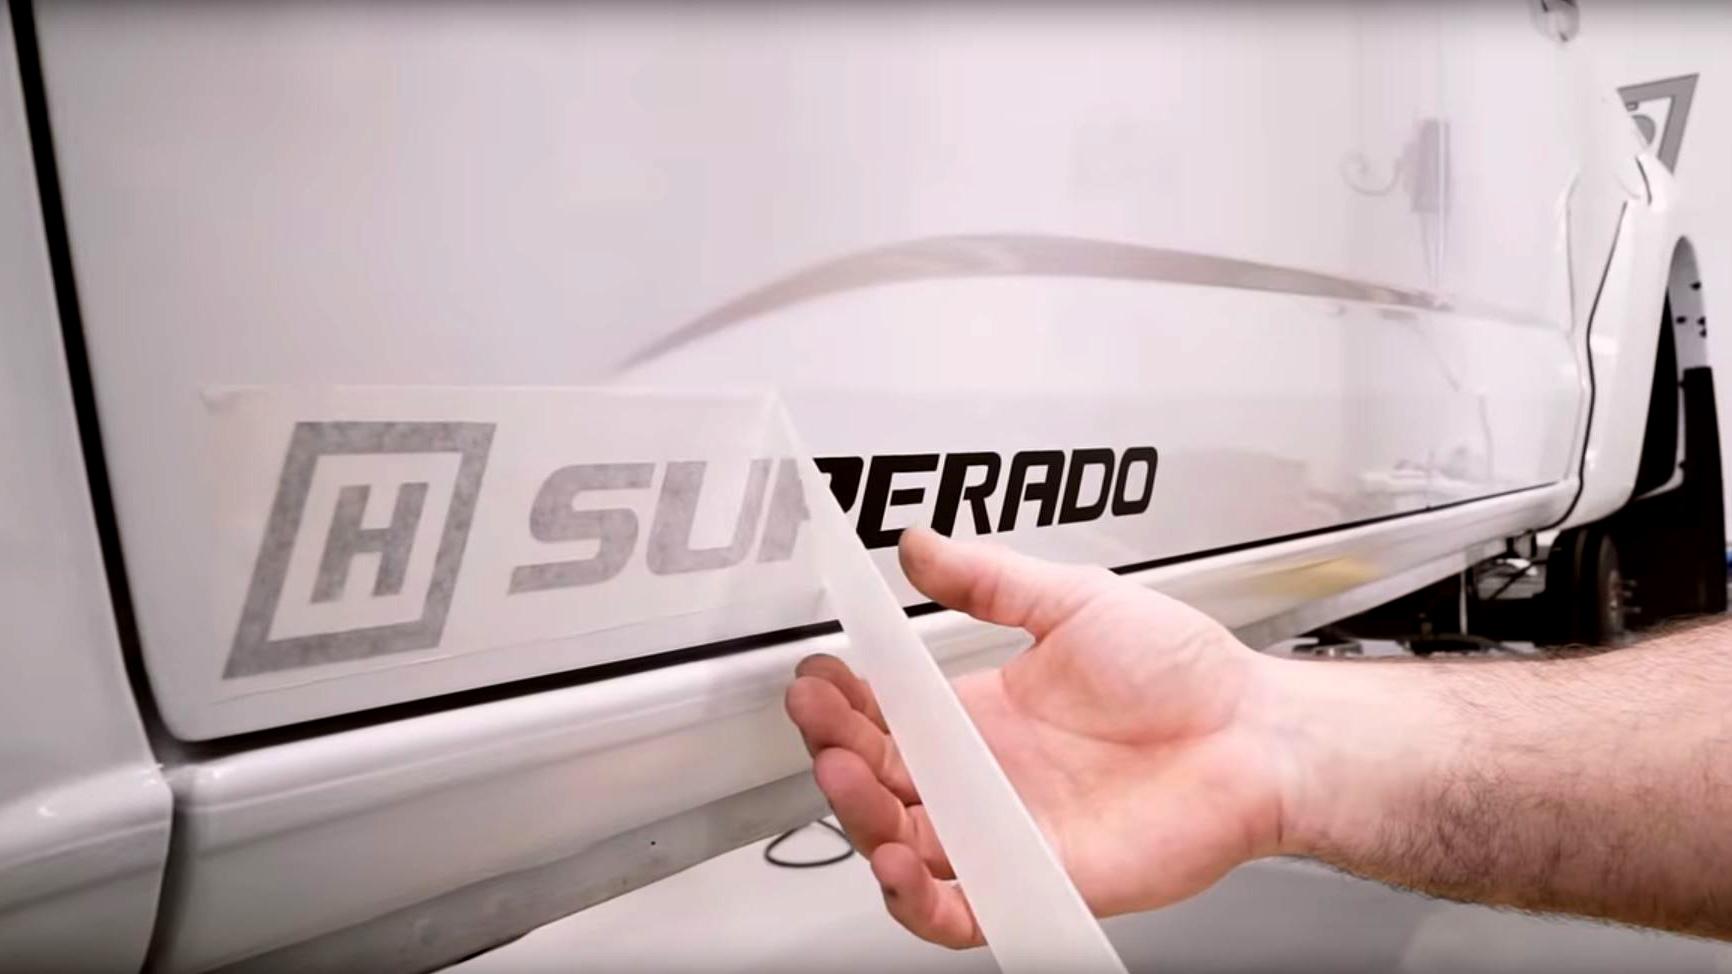 Superado – V8 Supercharged Ute by Harrop | UAW Local 2250